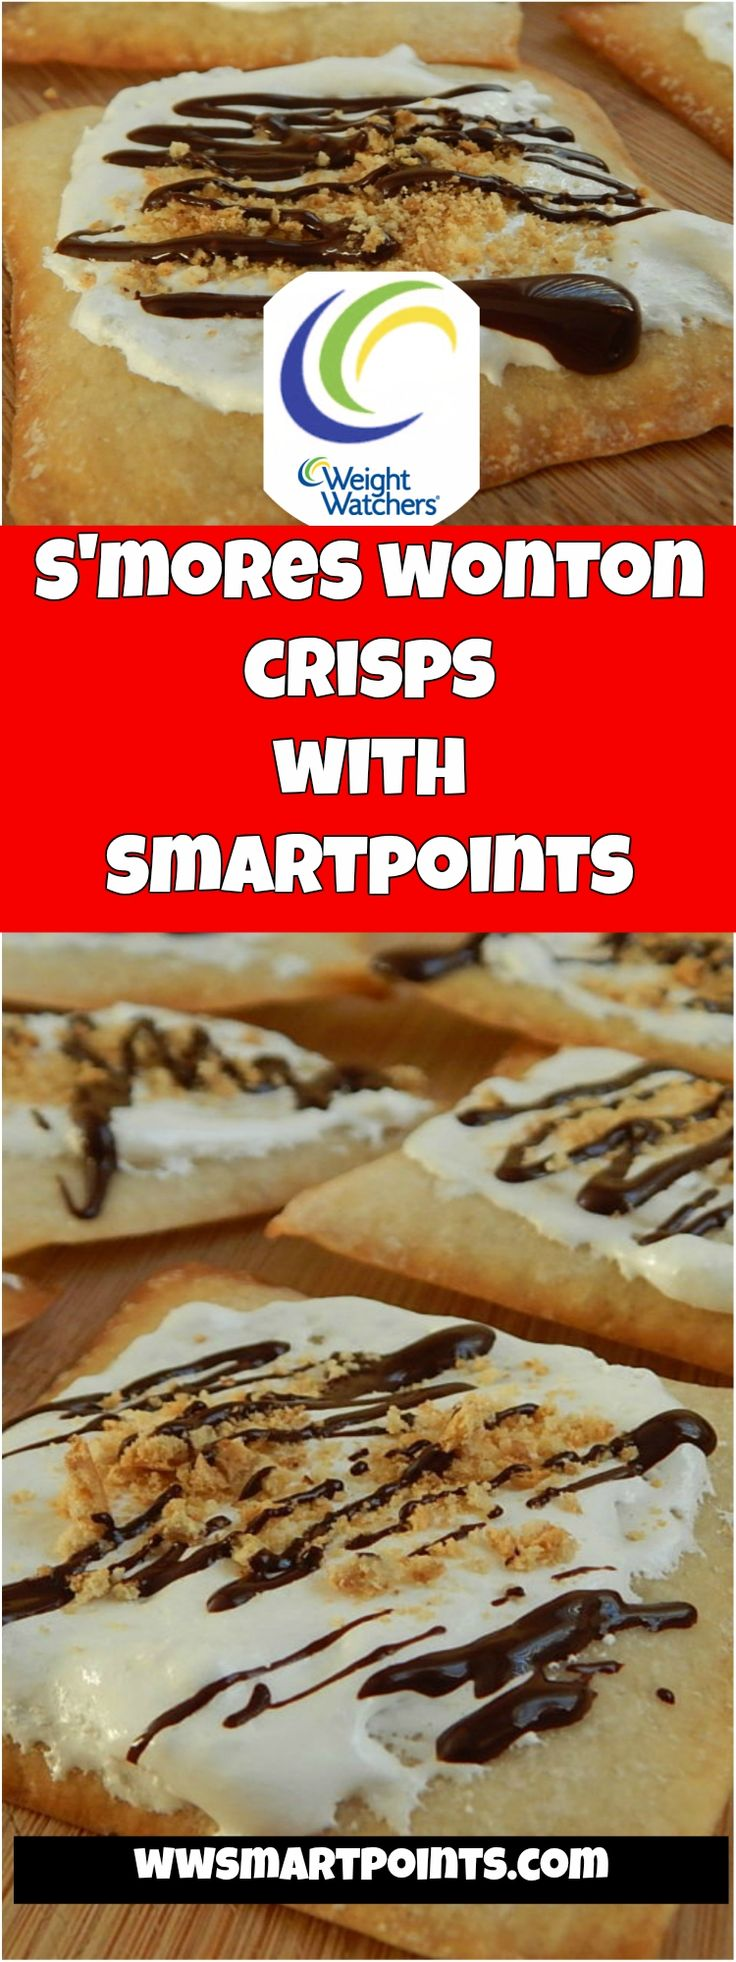 S'mores wonton crisps 1 weight watchers smartpoints